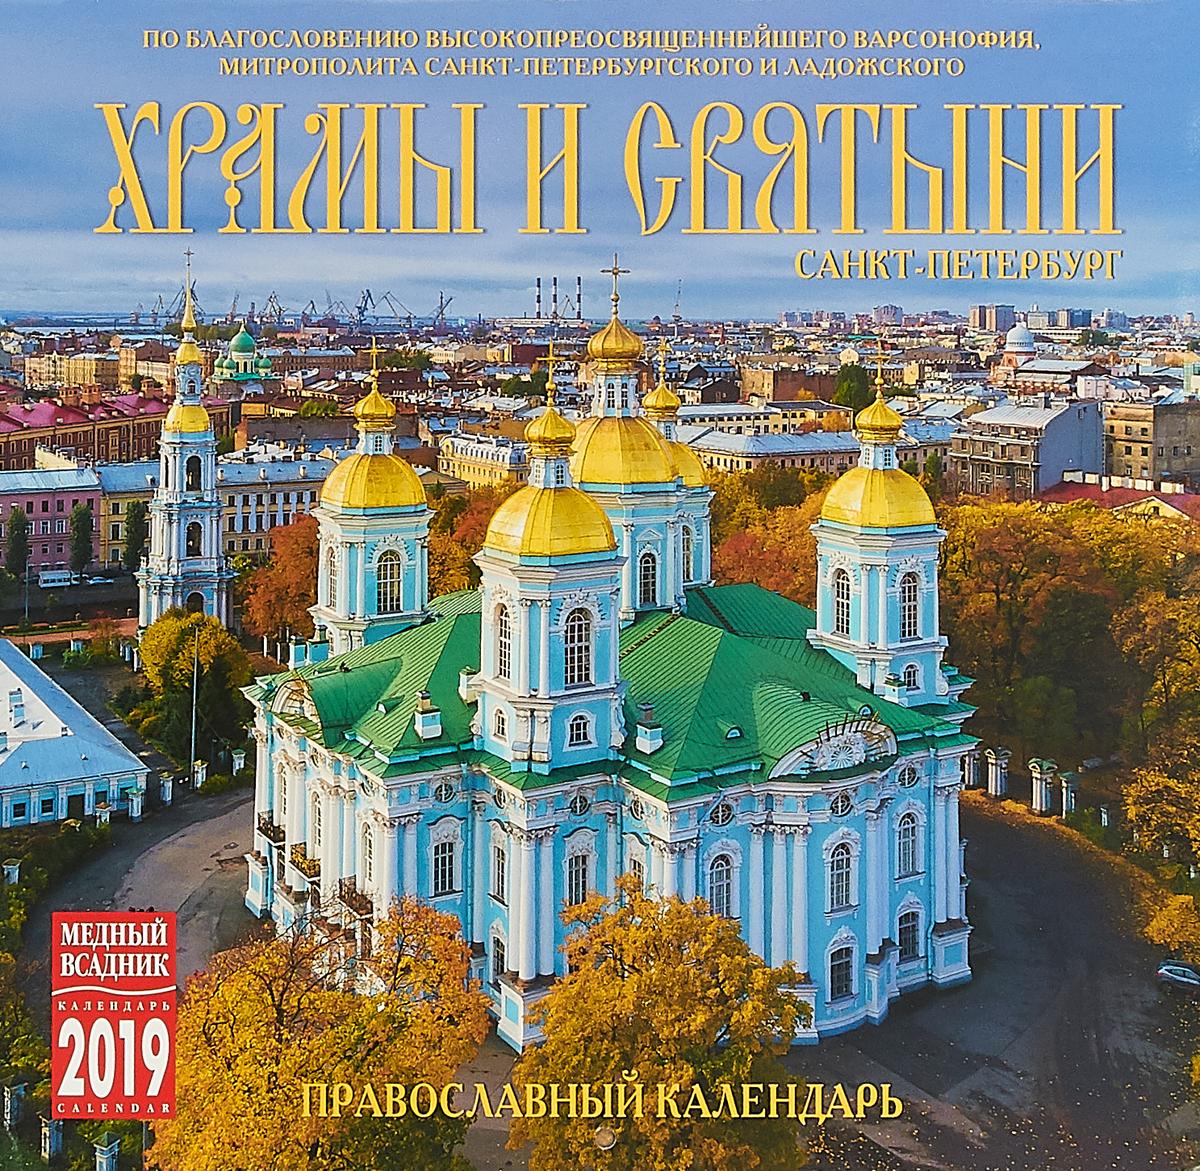 Календарь на спирали на 2019 год. Храмы и святыни Санкт-Петербурга вузы санкт петербурга 2018 2019